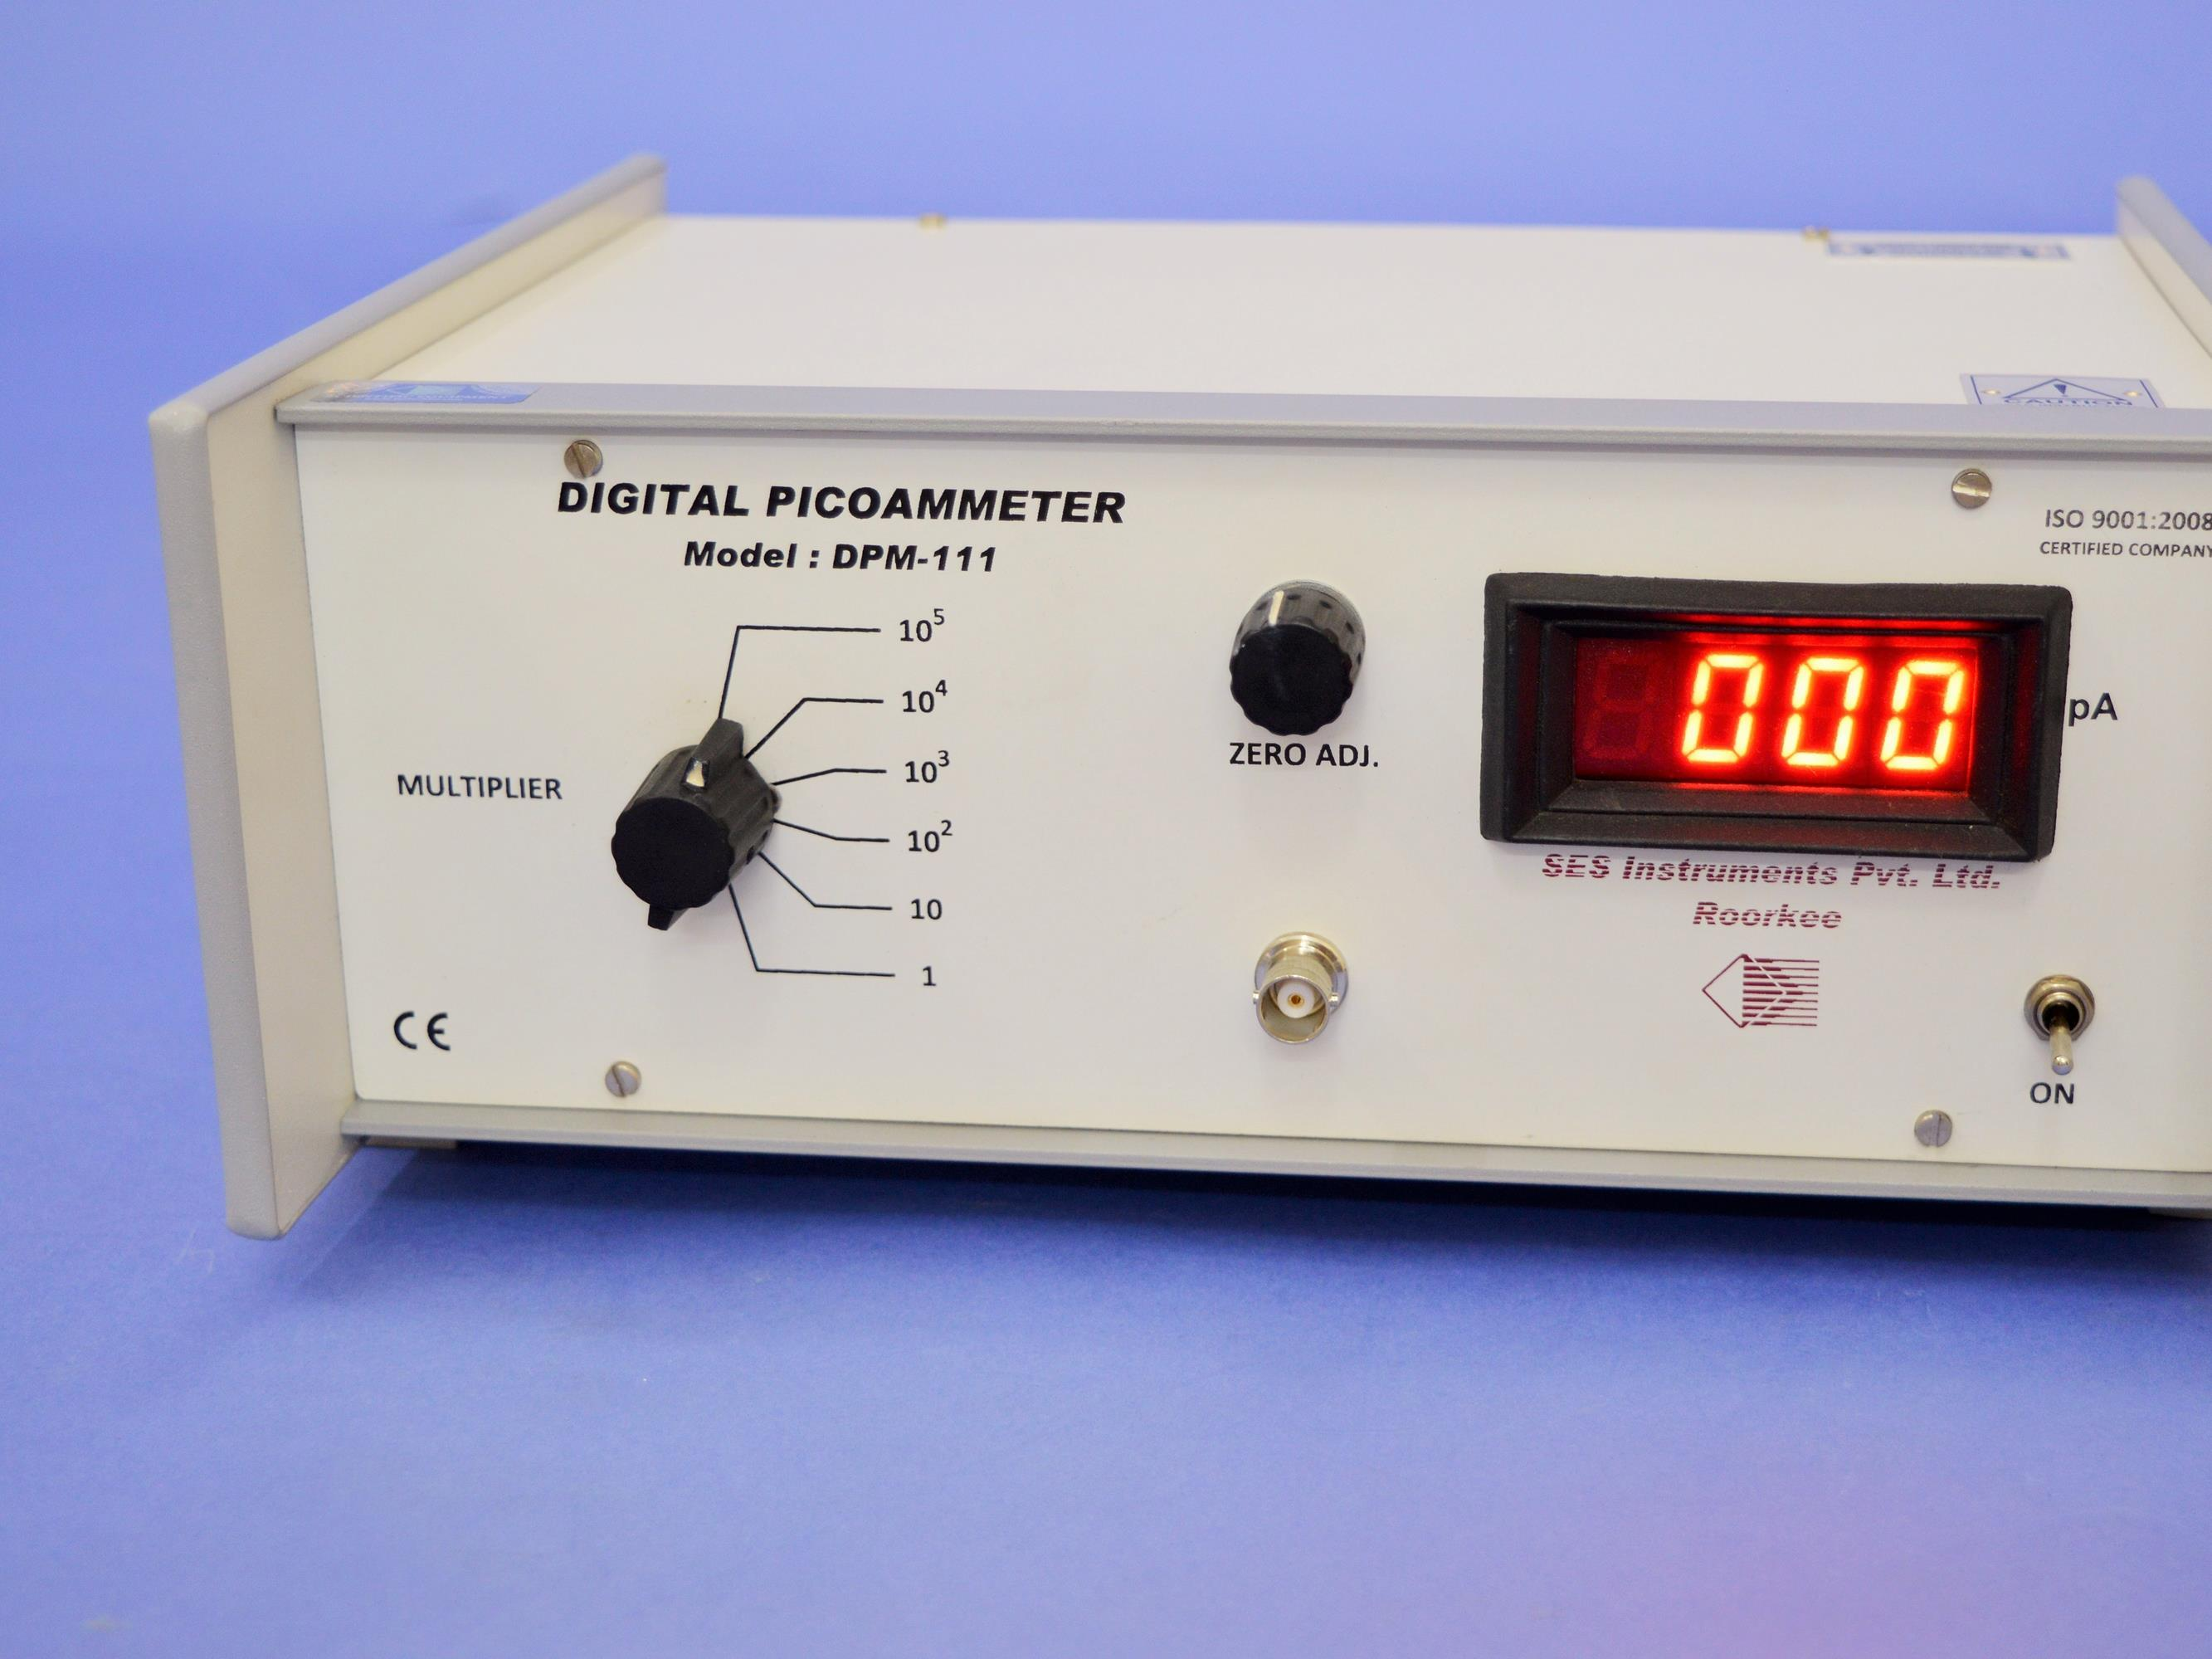 Digital Picoammeter, DPM-111